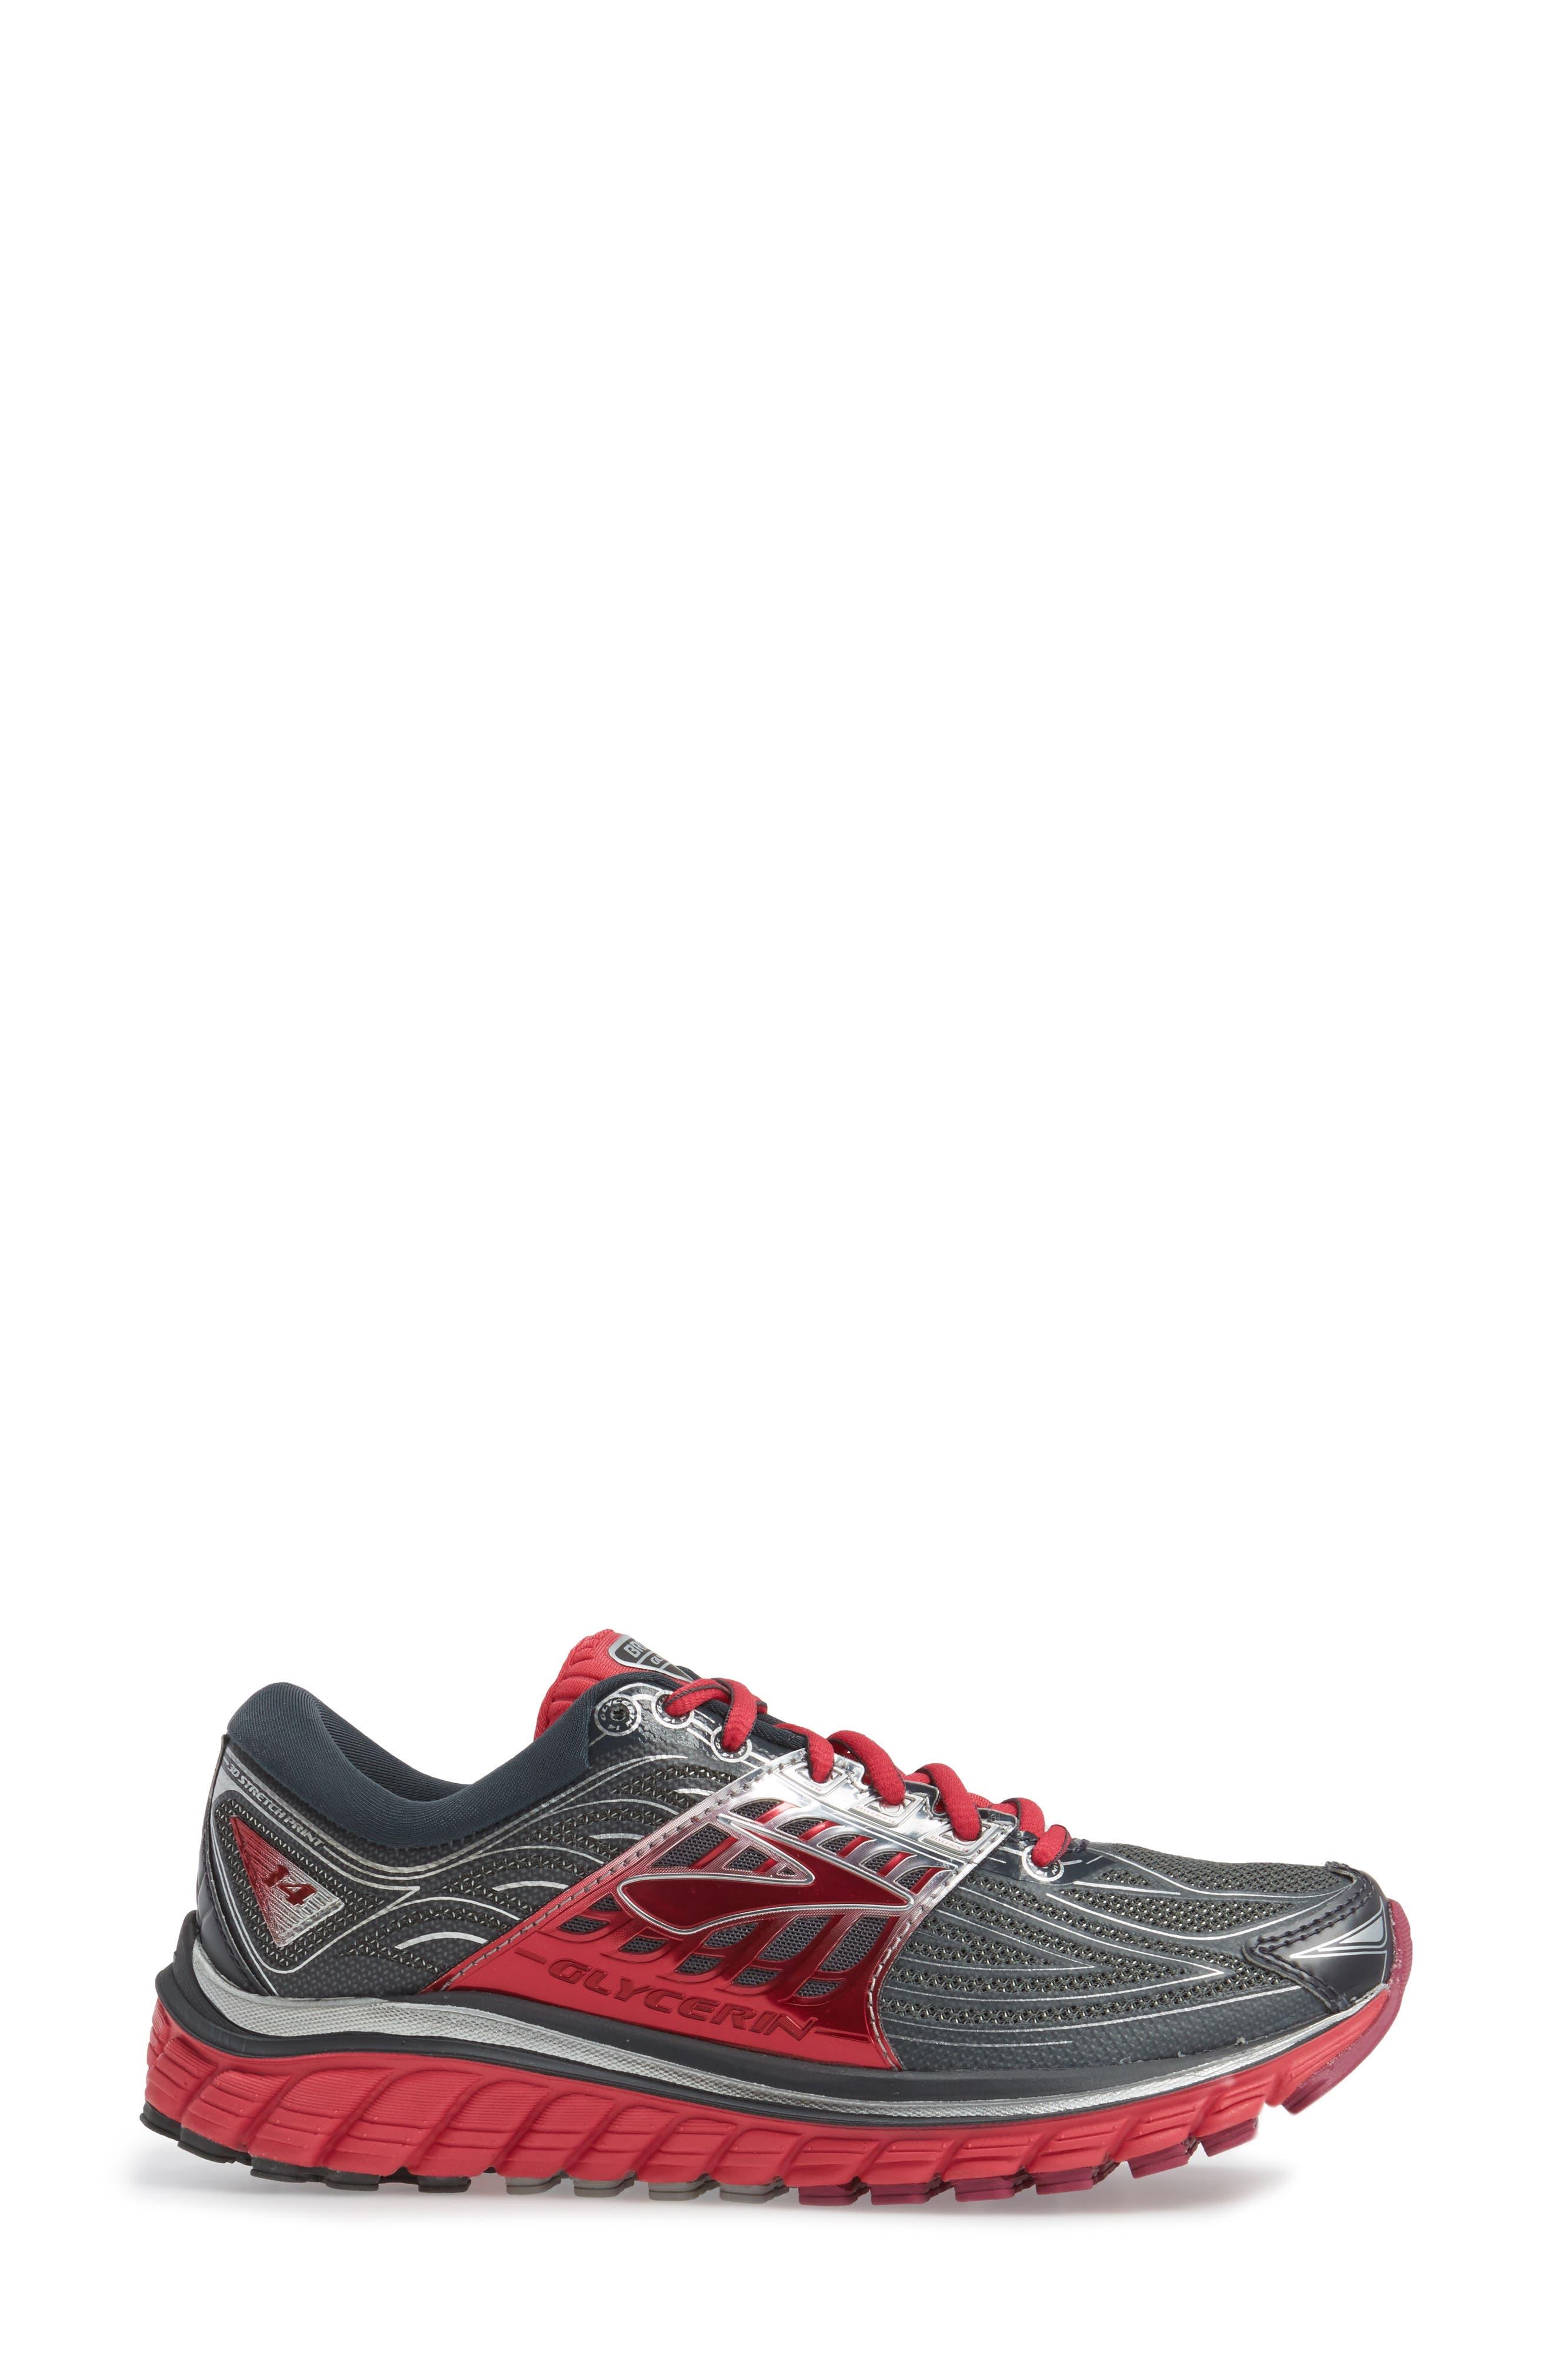 Alternate Image 3  - Brooks 'Glycerin 14' Running Shoe (Women)